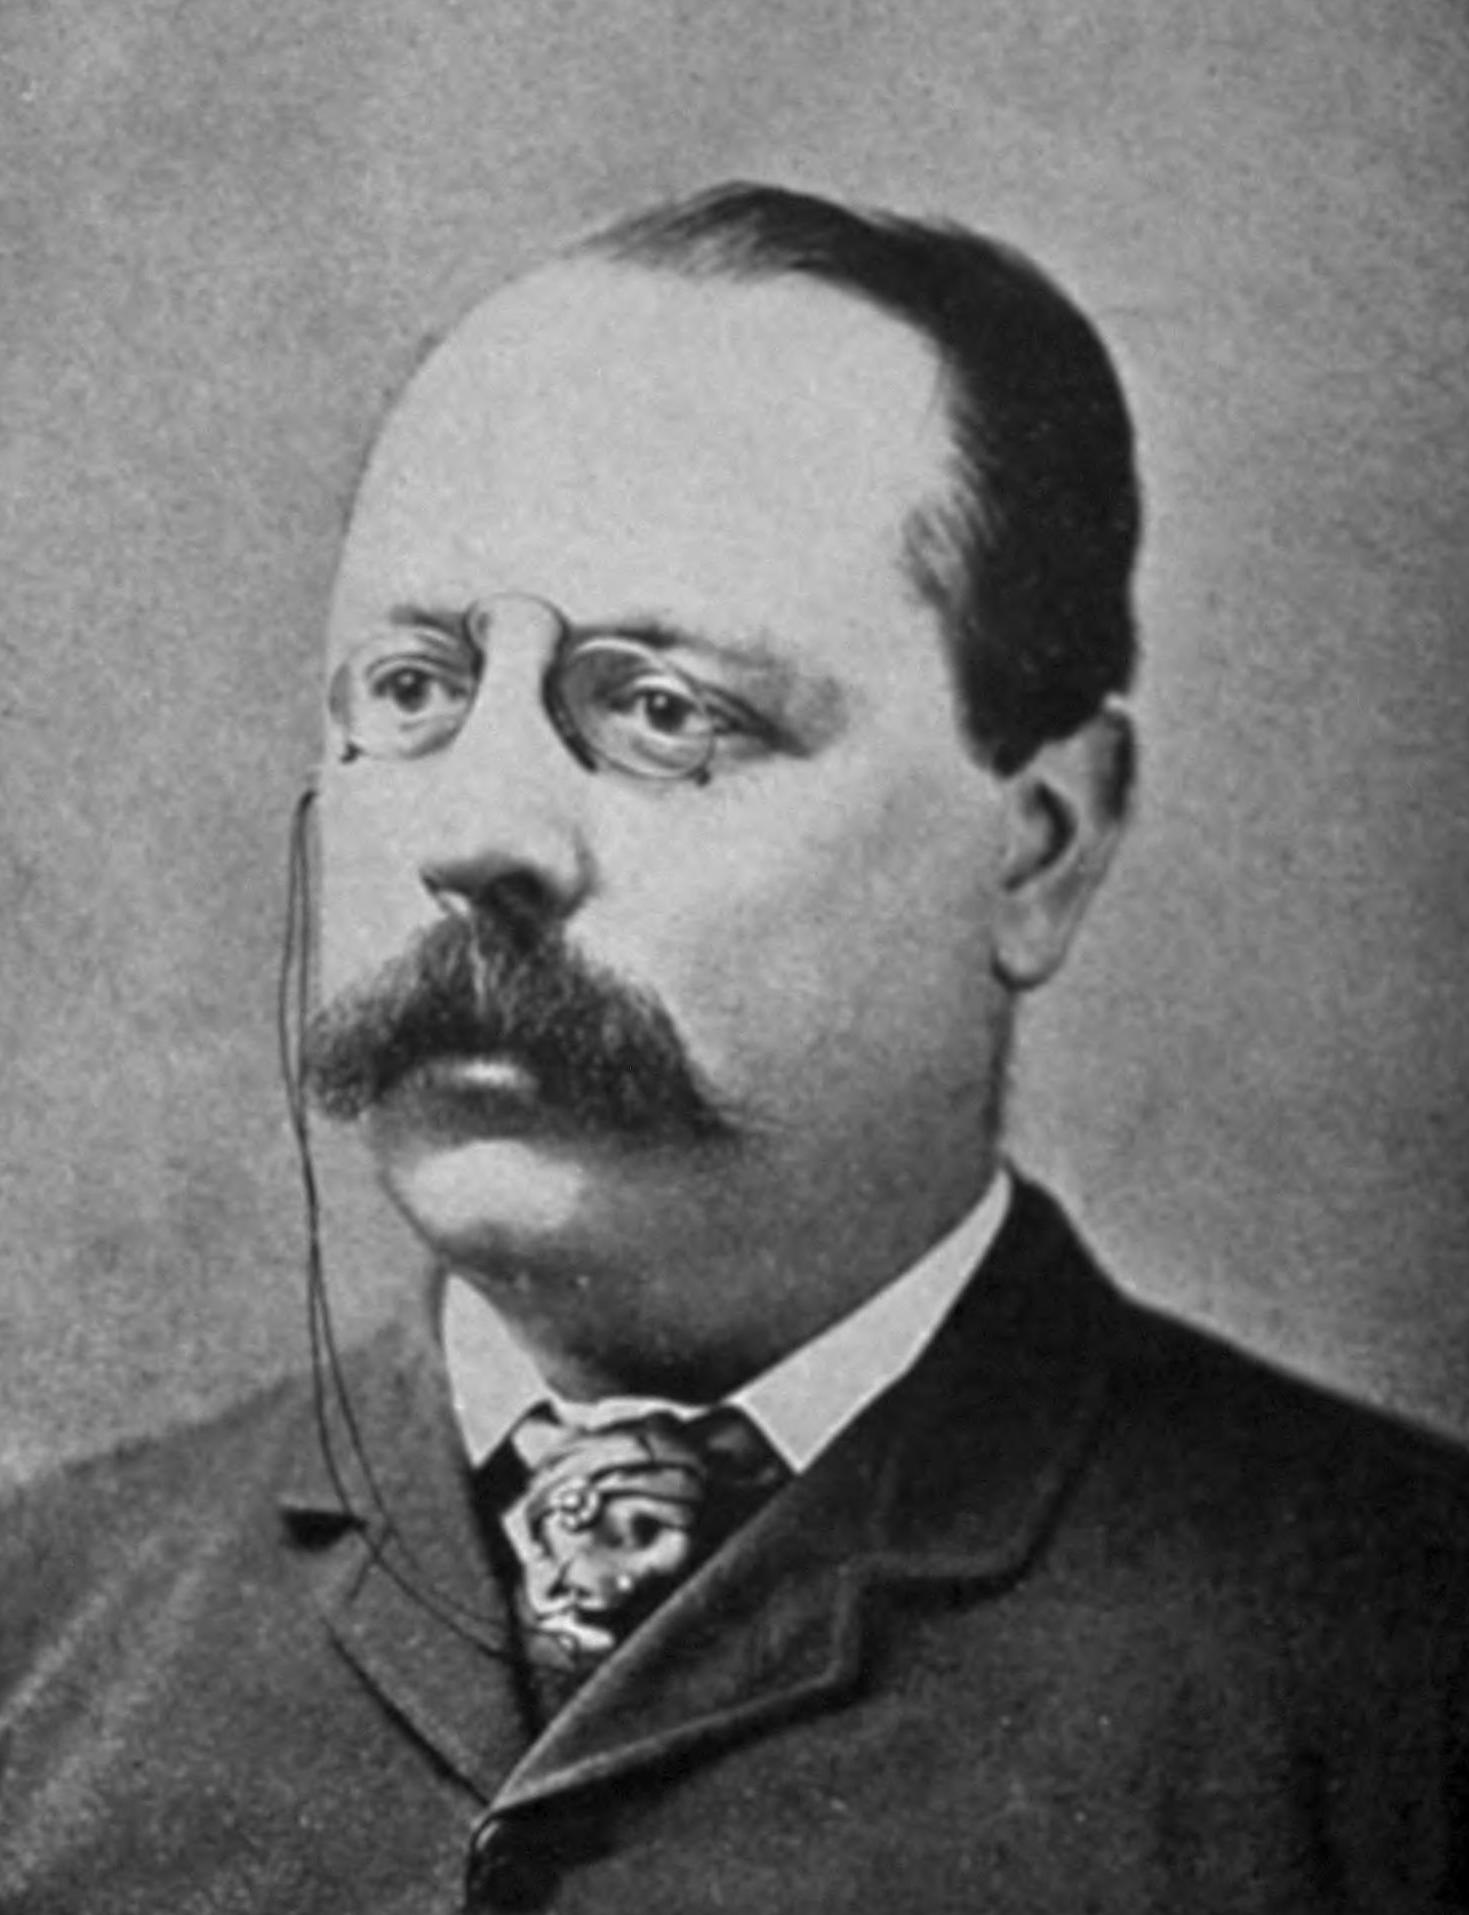 Archibald Clavering Gunter